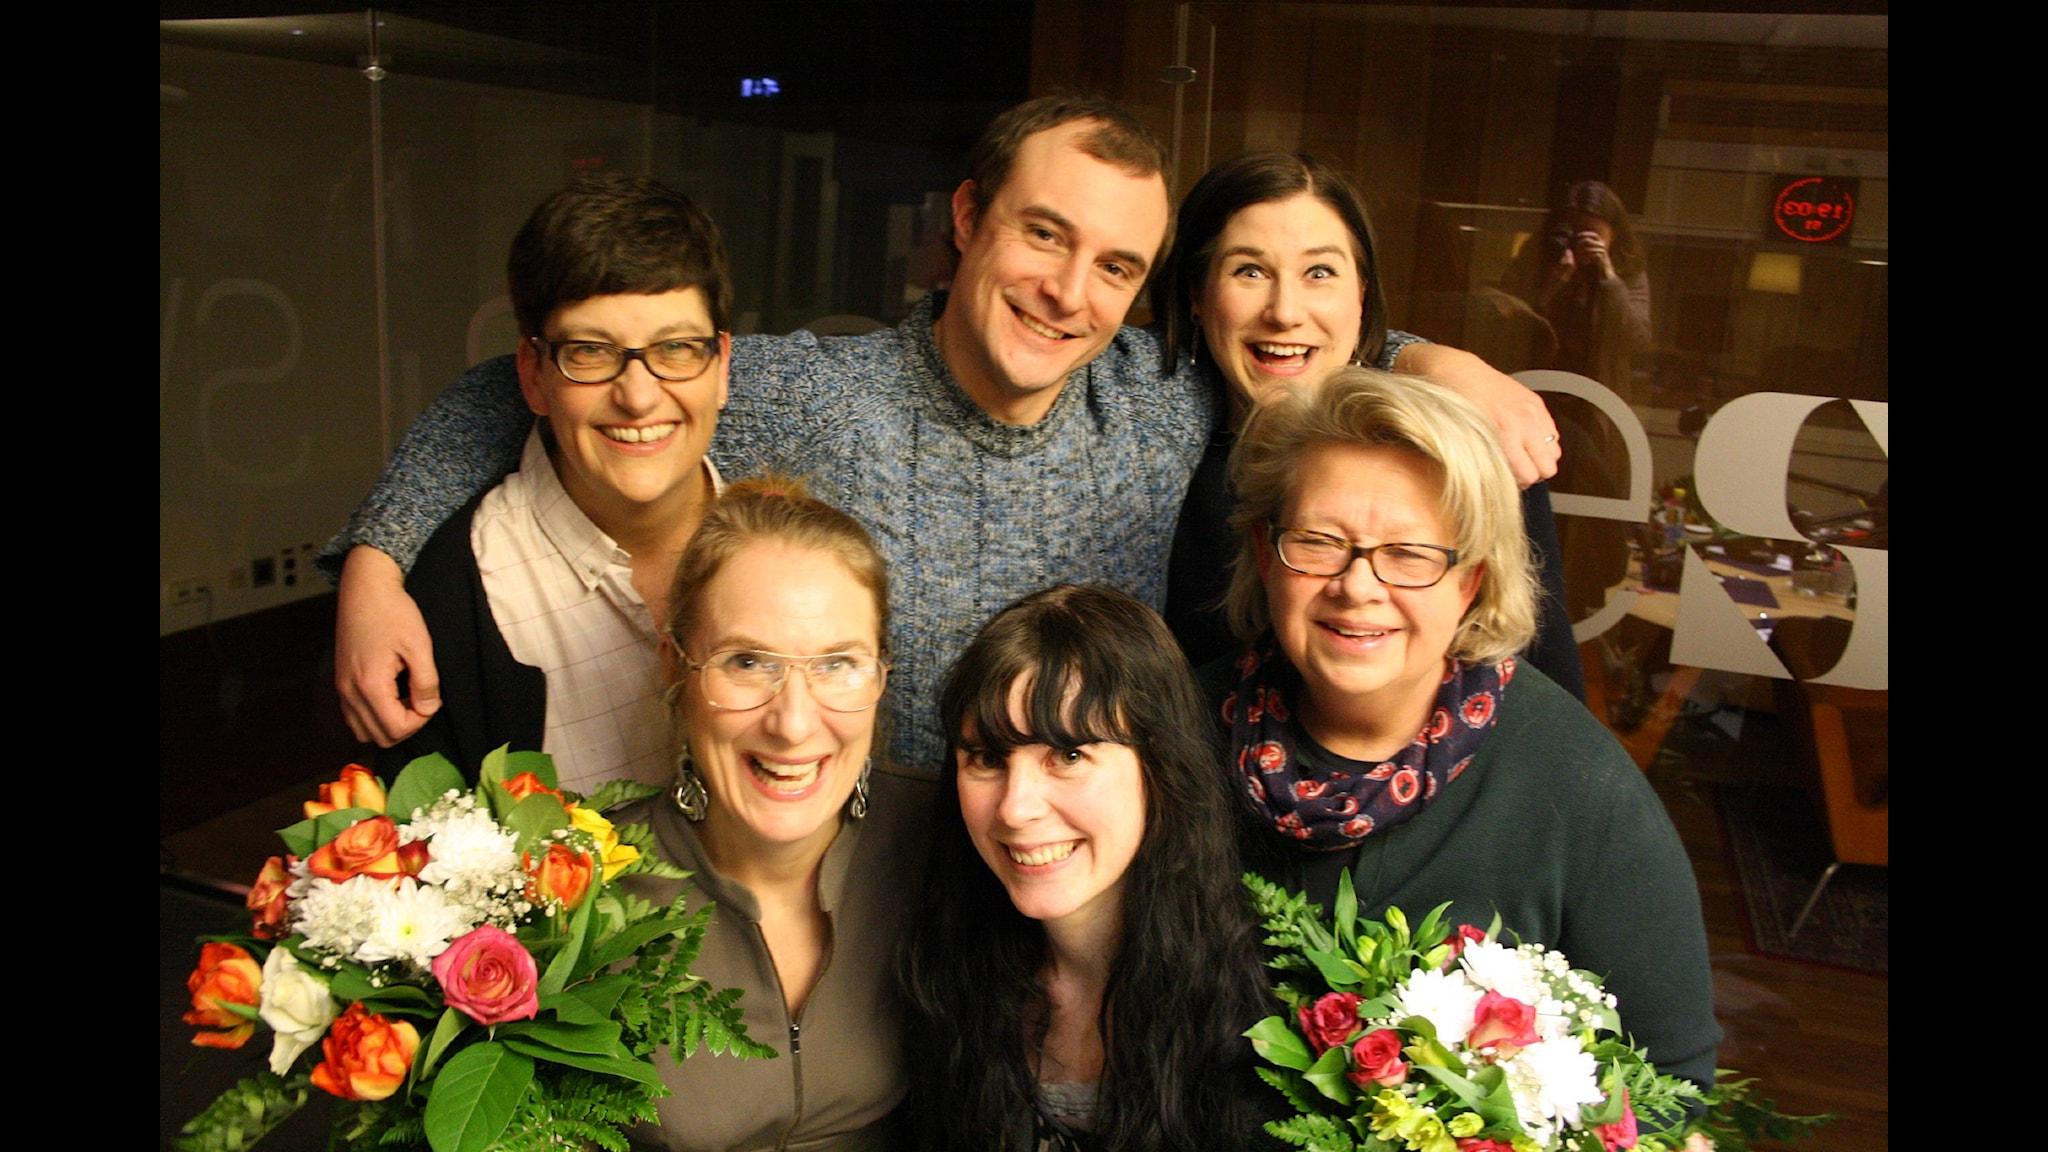 Kristin Lundell, Johan Hilton, Helle Klein, Karin Lennmor, Annika Lantz och Elin Lövestam. Foto: Anna-Karin Ivarsson/SR.